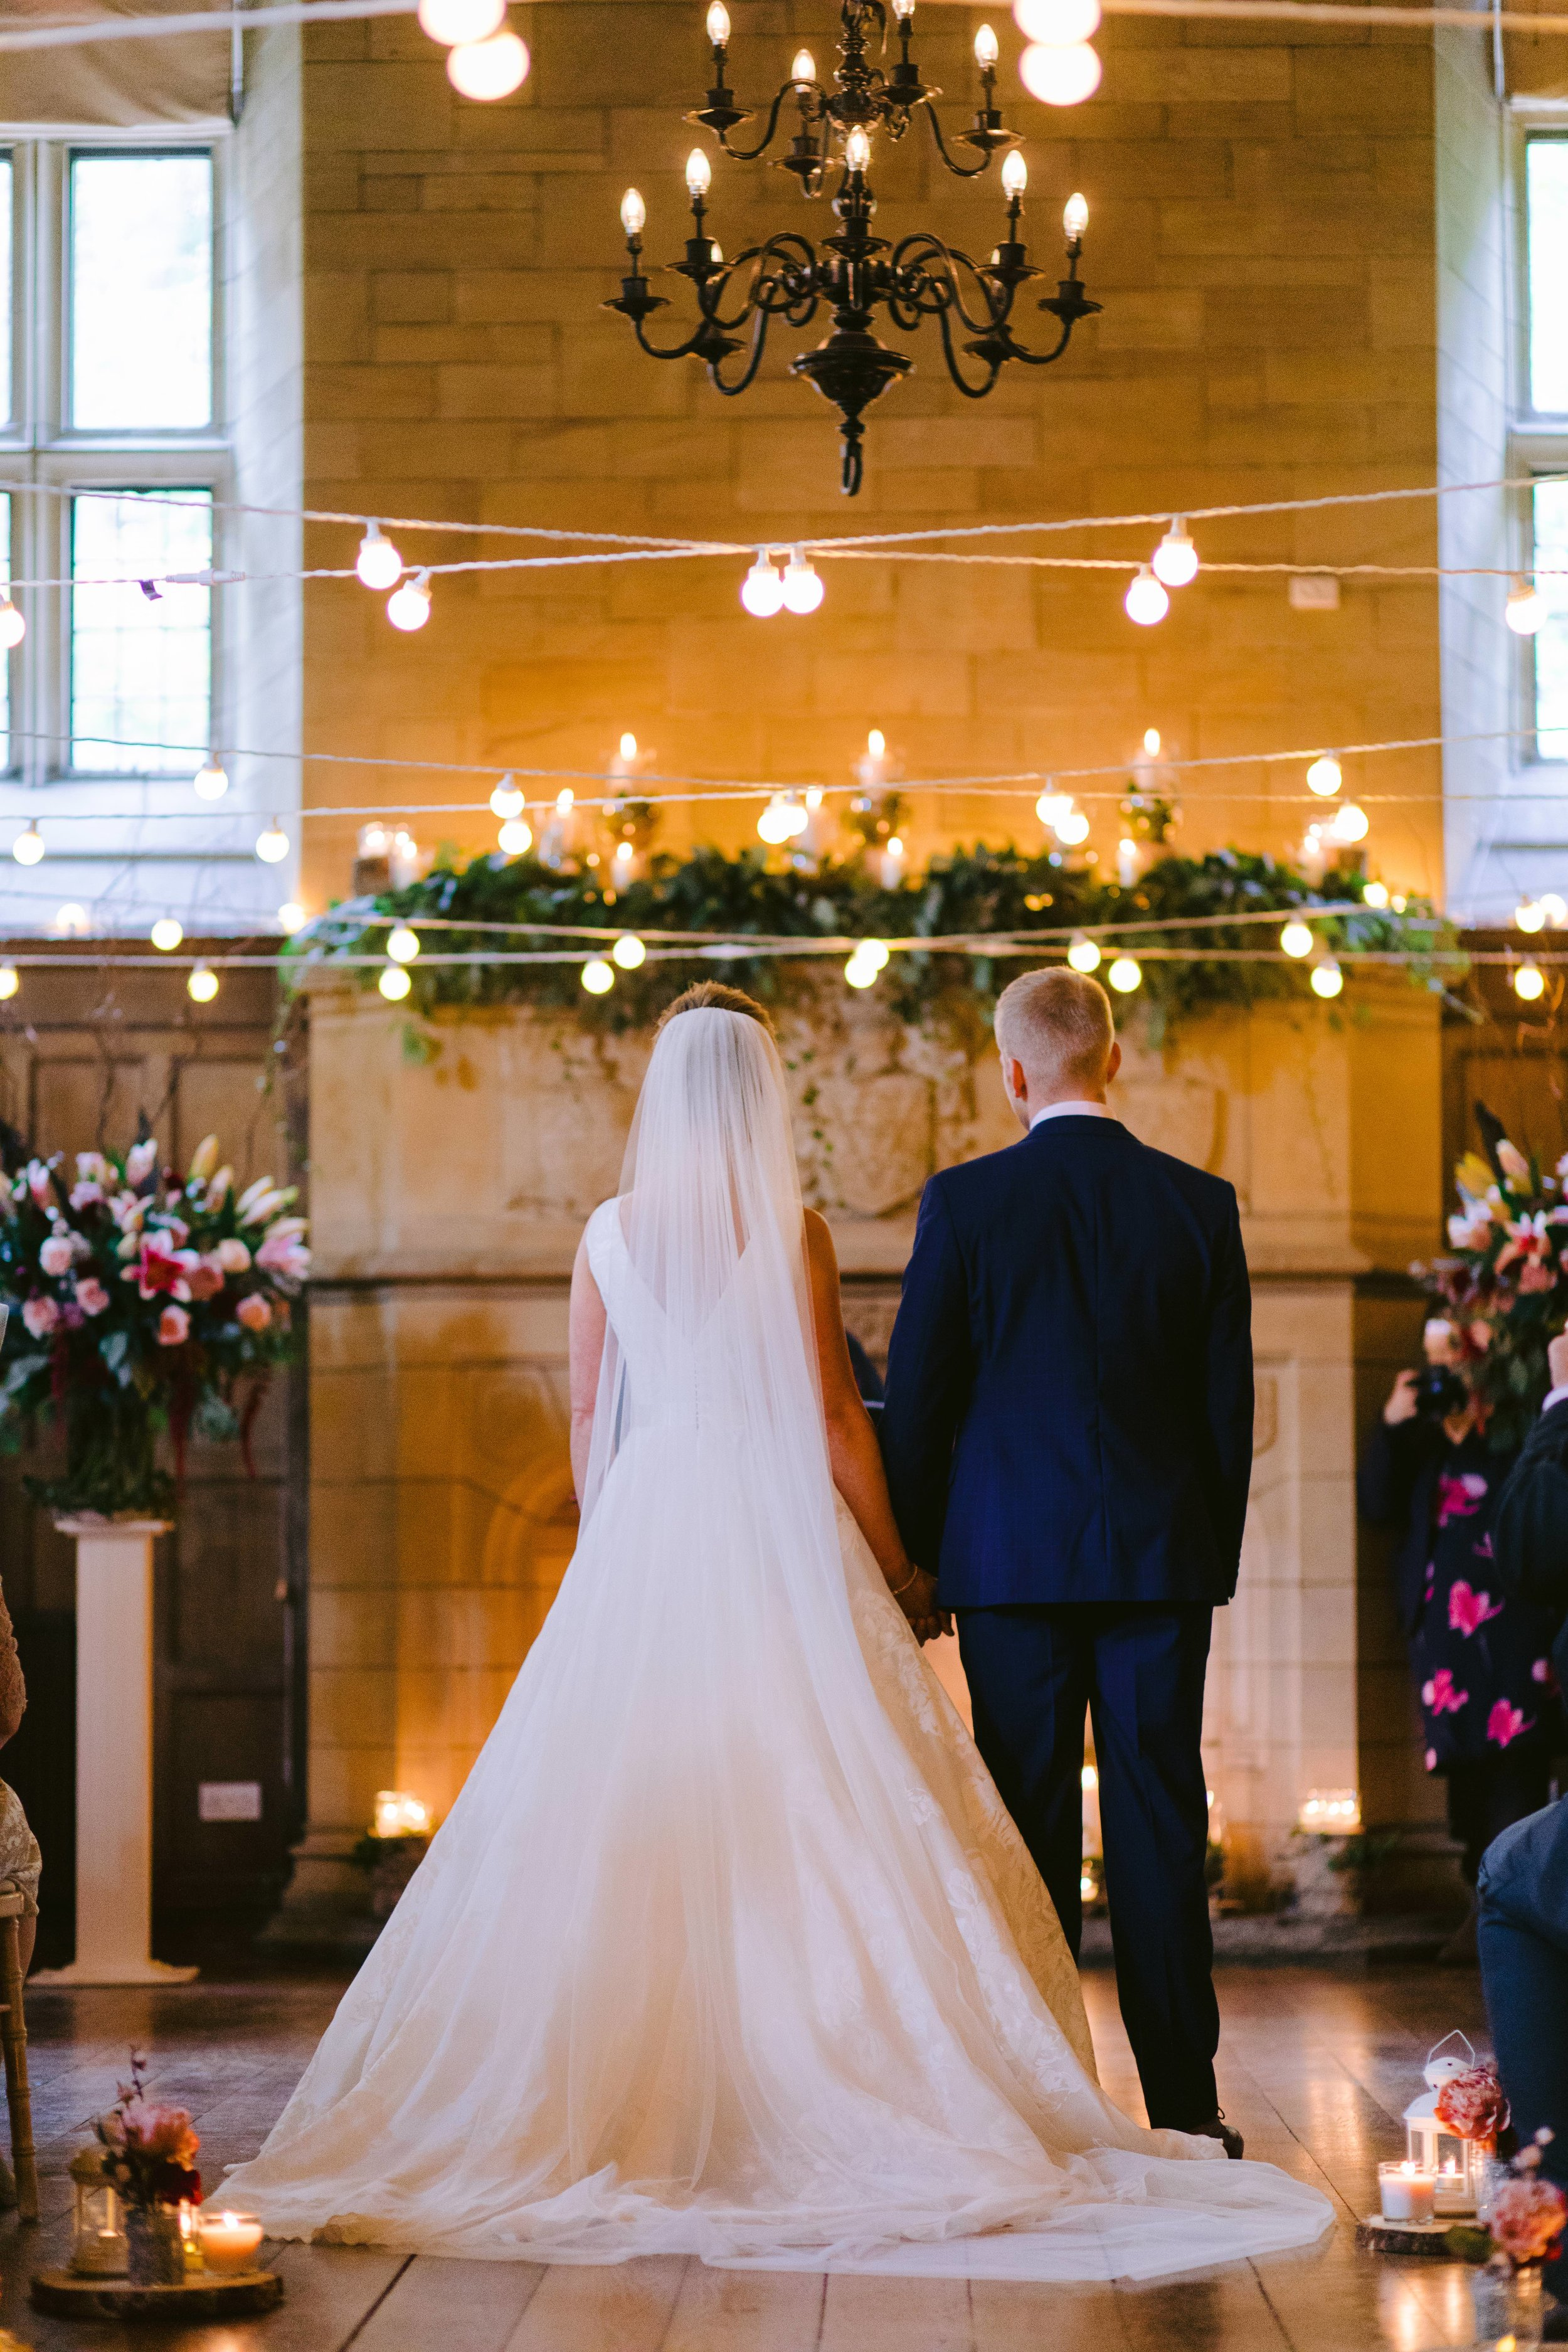 Karin_and_Shauns_Wedding_-_Achnagairn_Castle_-_www.eilidhrobertson.co.uk-393.jpg